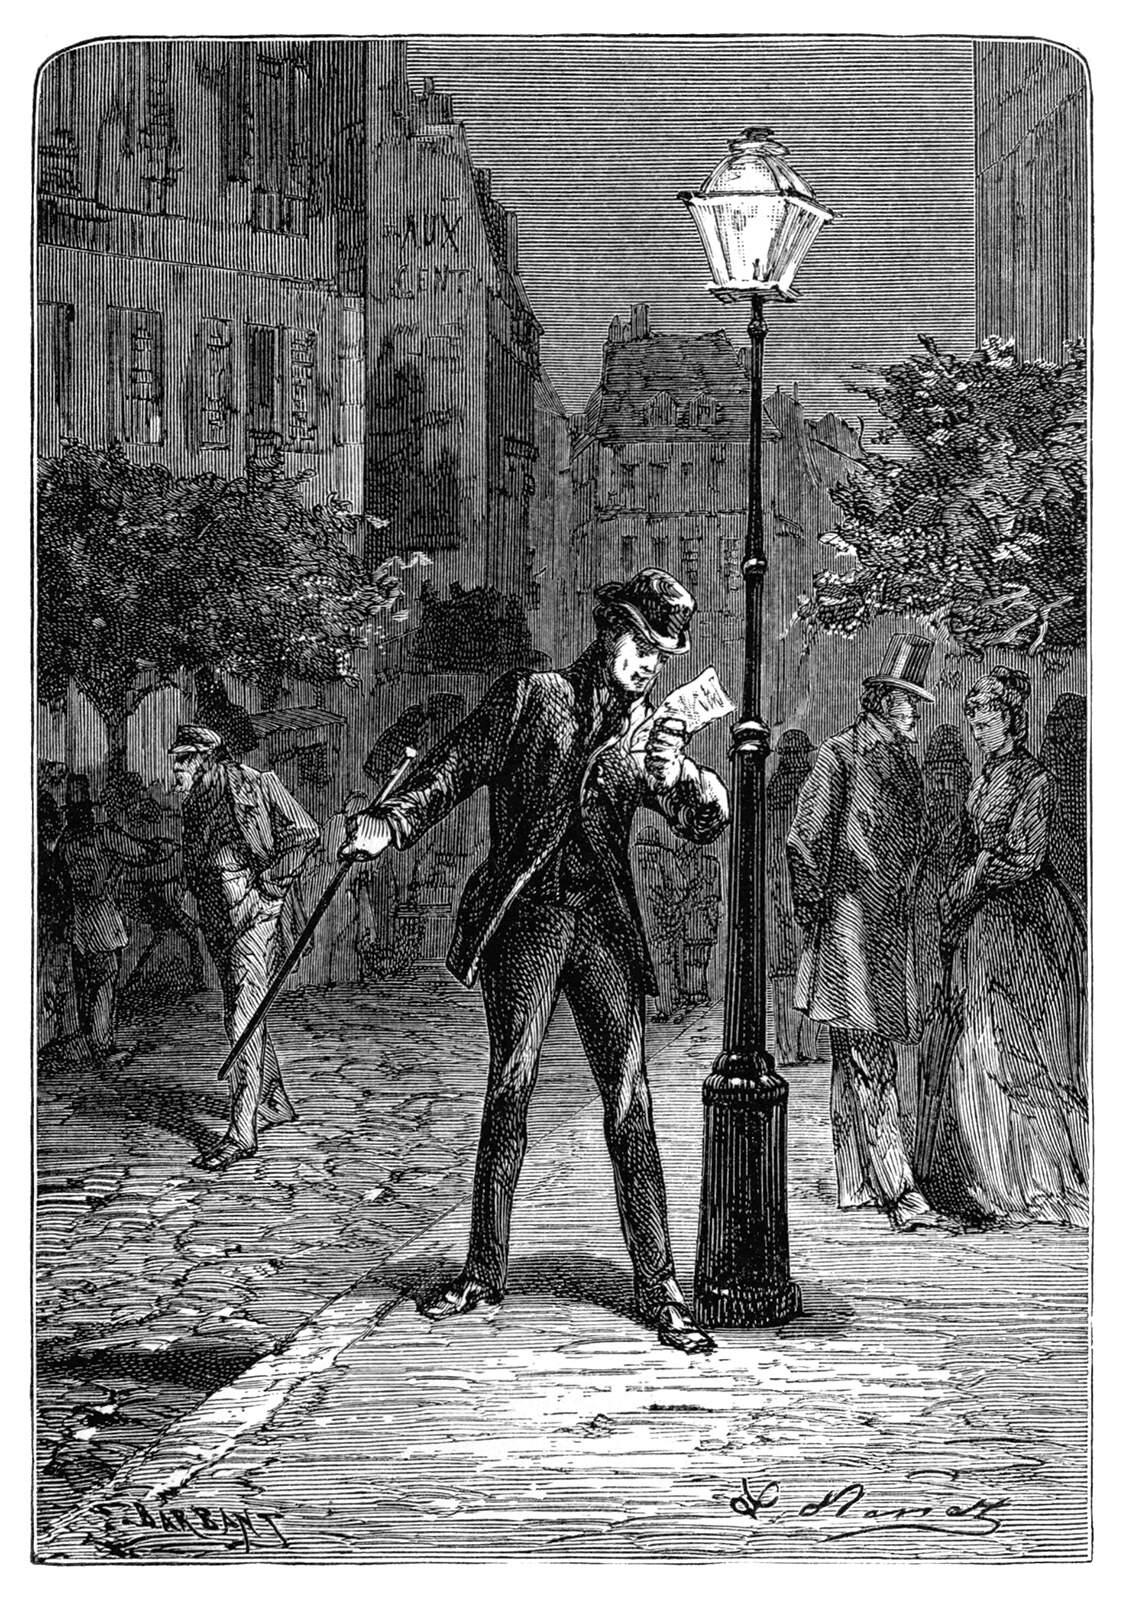 Under a streetlamp a man reads a letter